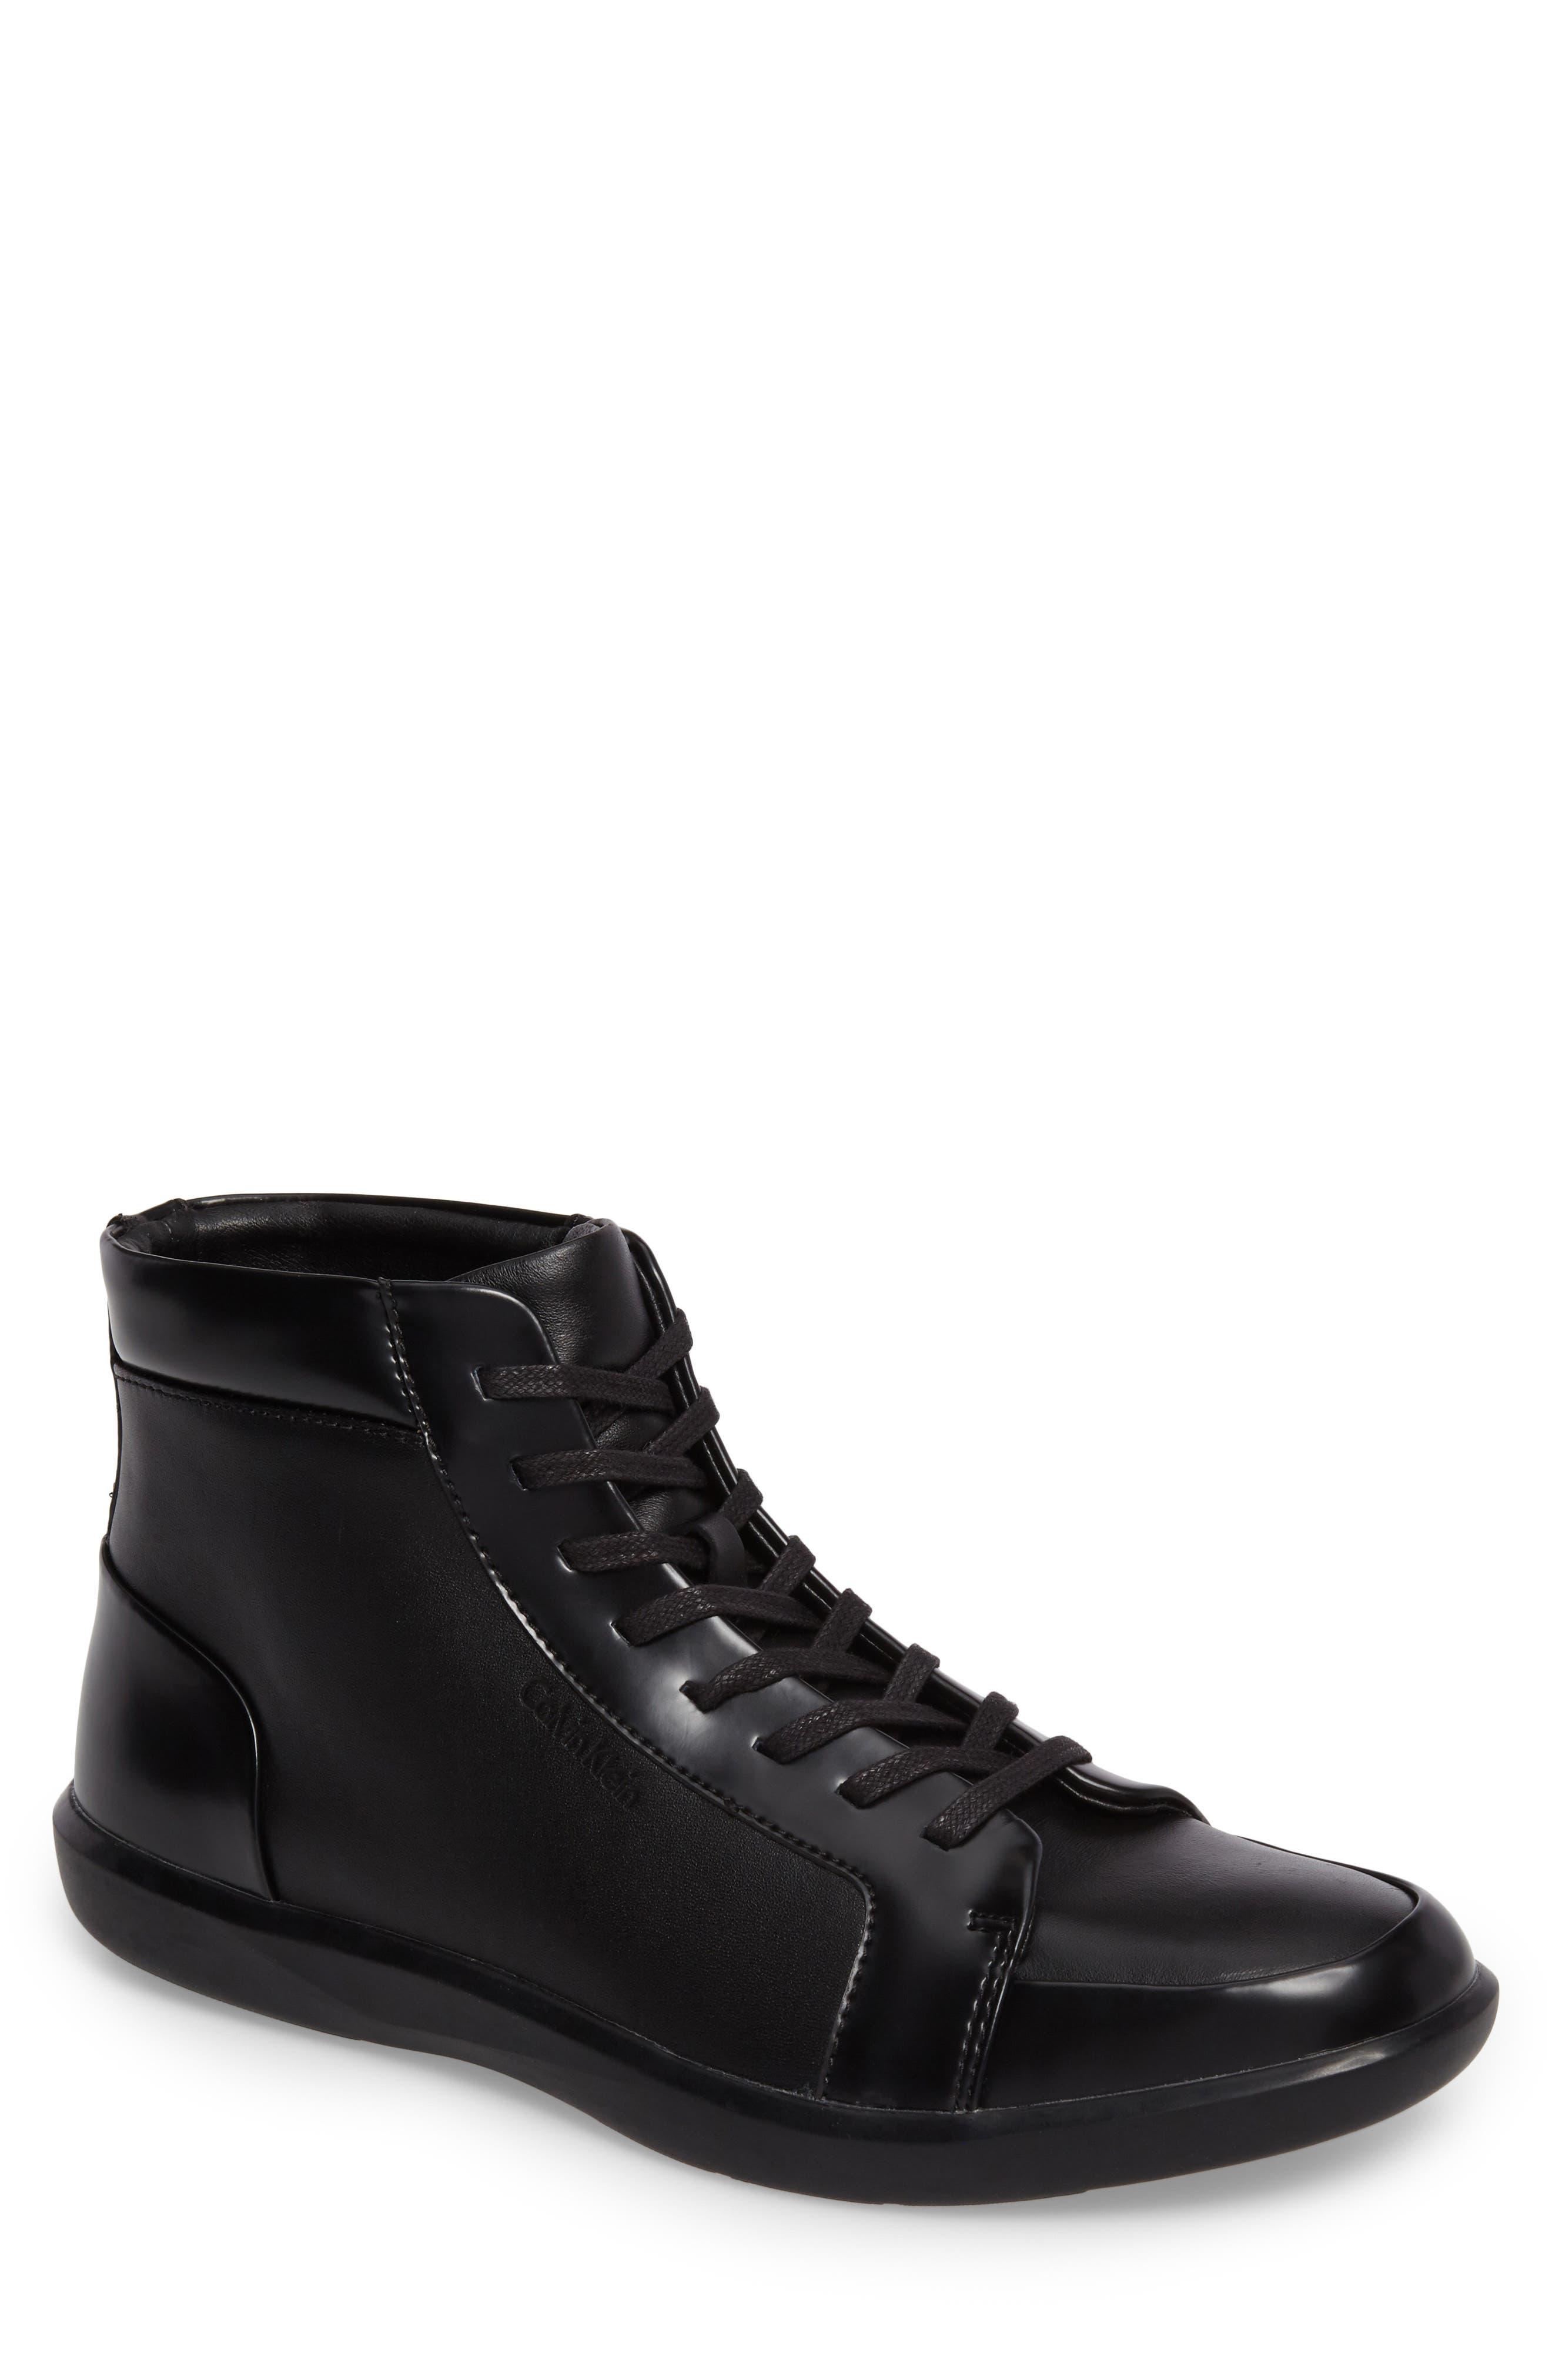 Malvern Sneaker,                             Main thumbnail 1, color,                             001